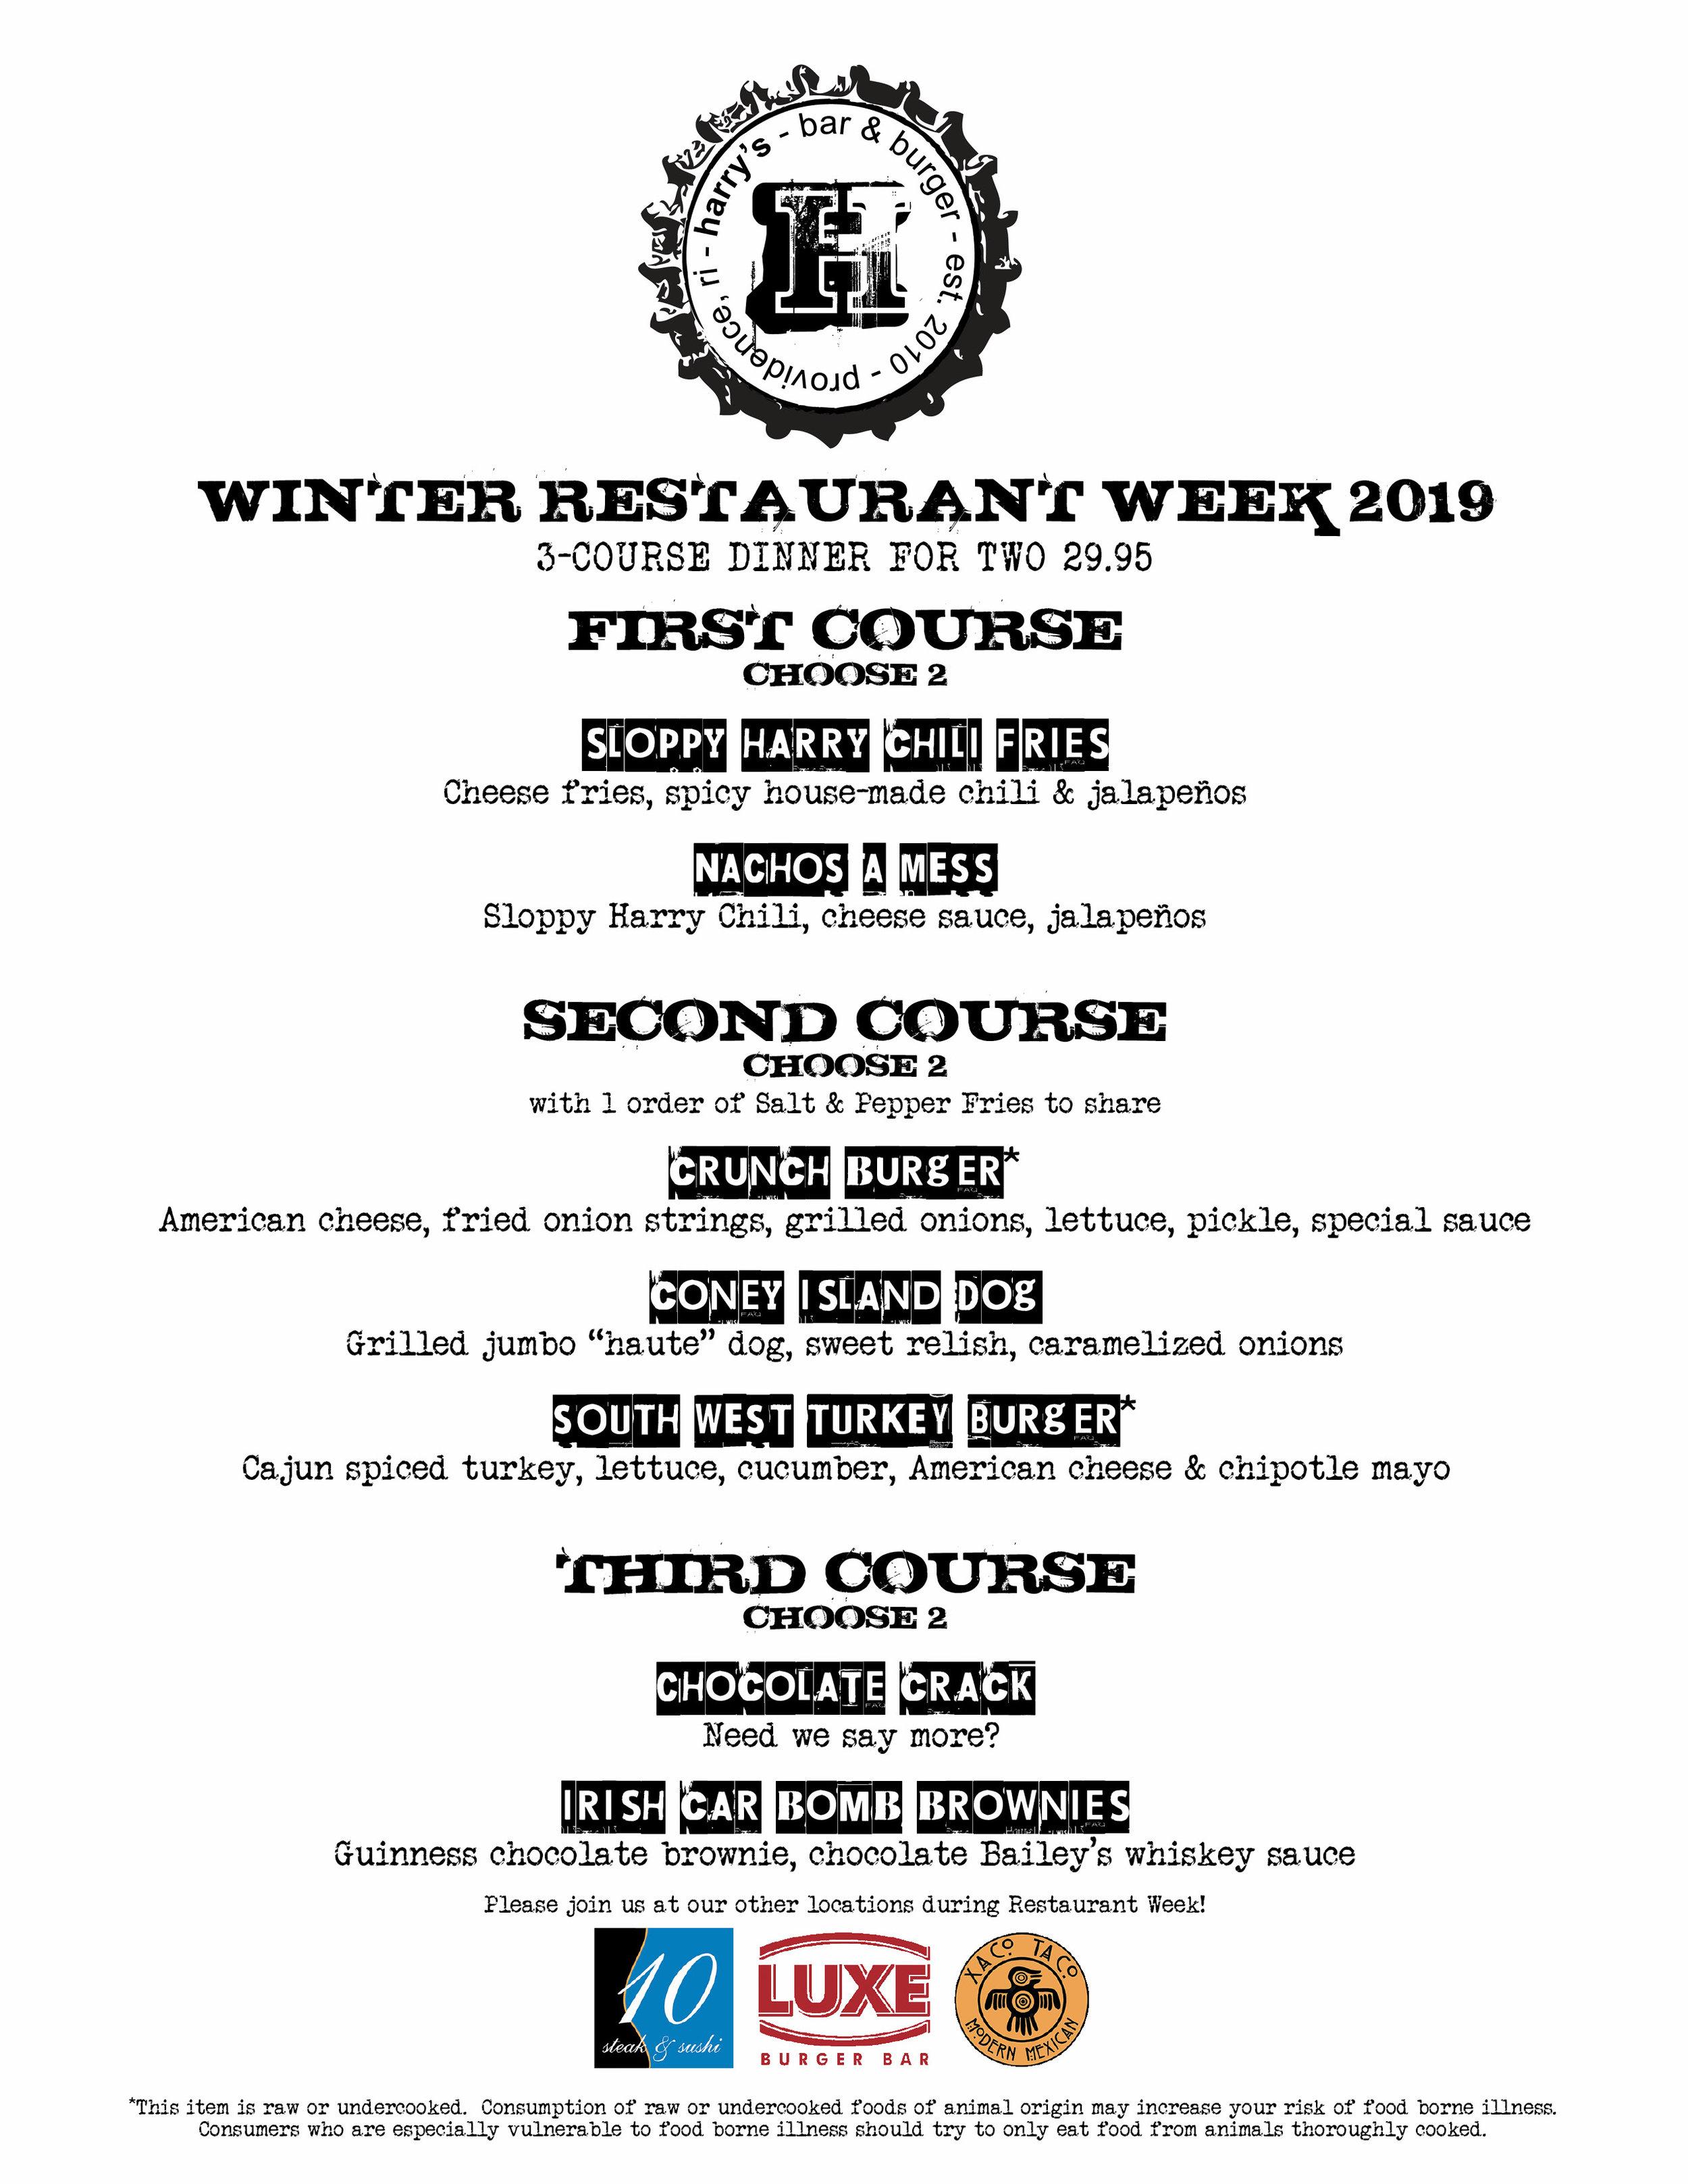 RW_harrys_DINNER winter 2019.jpg